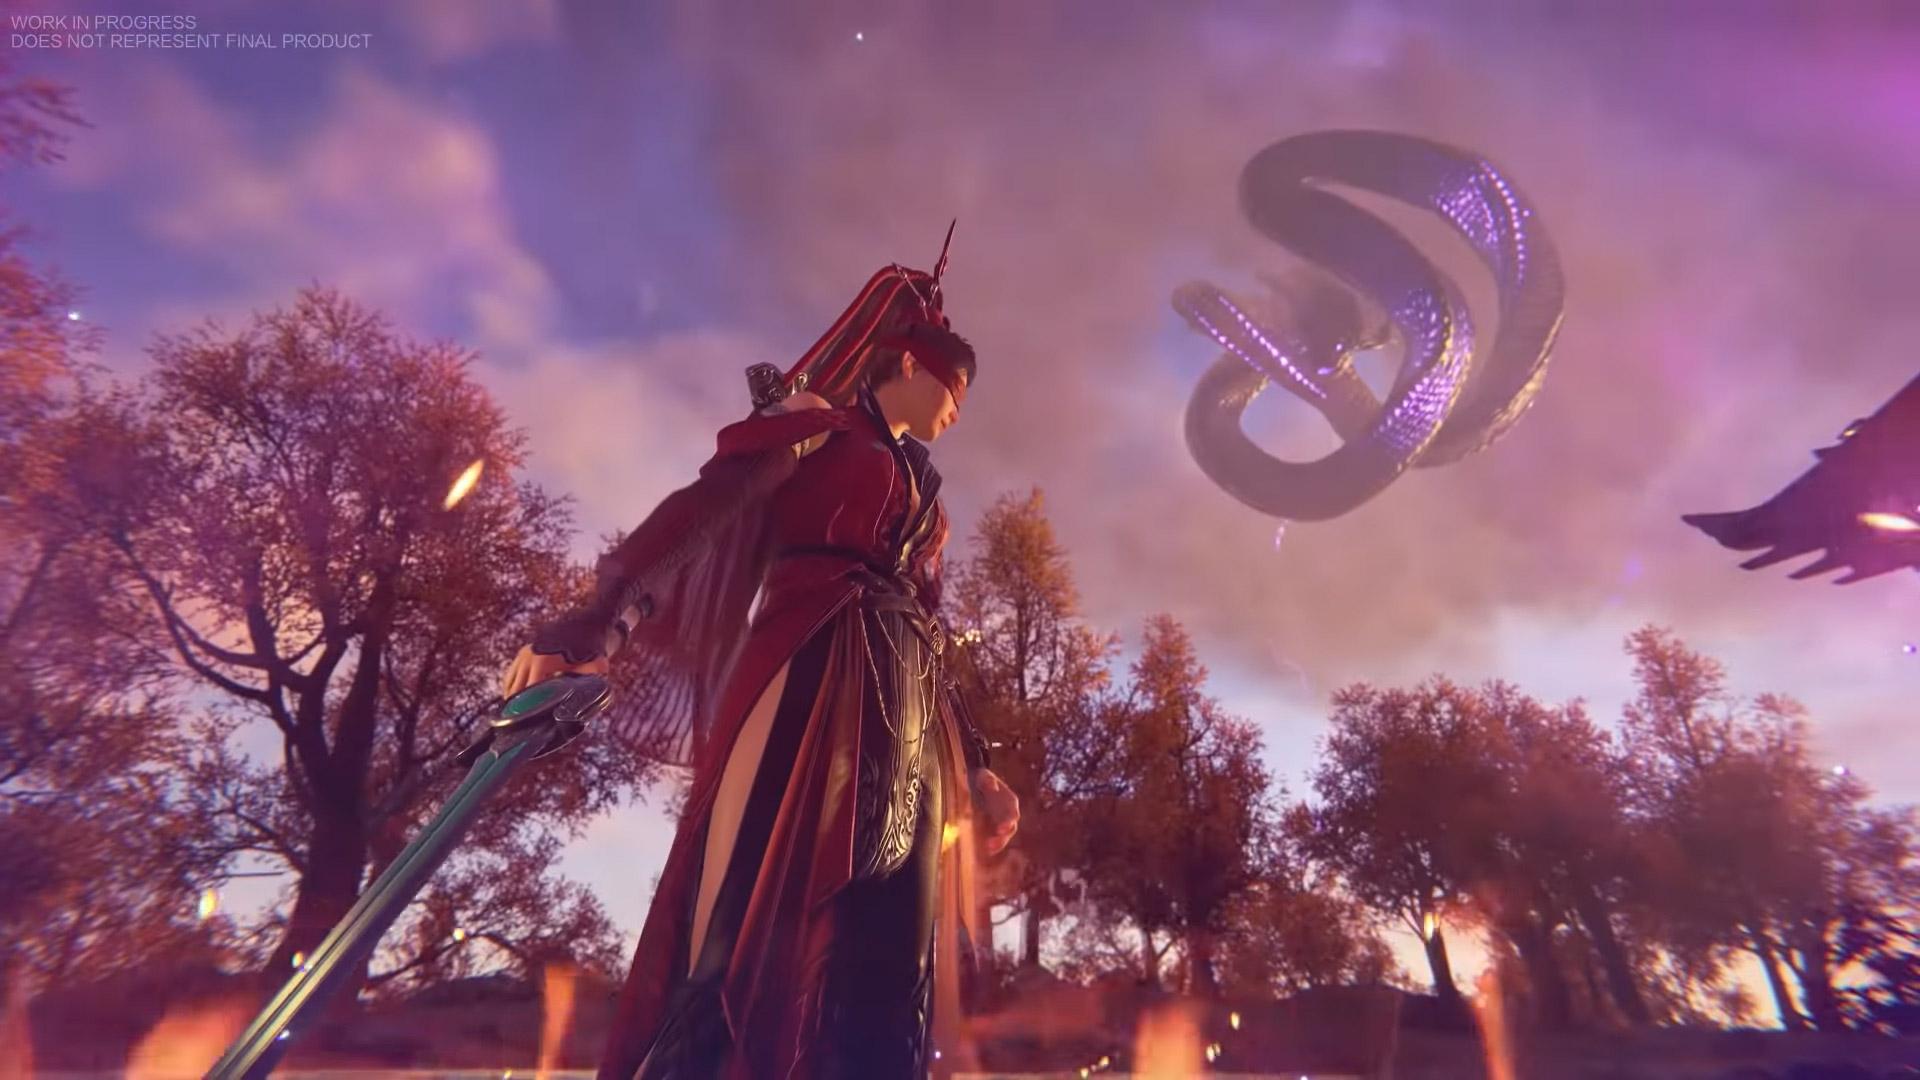 naraka:-bladepoint-gameplay-trailer-raises-the-hype-for-its-open-beta